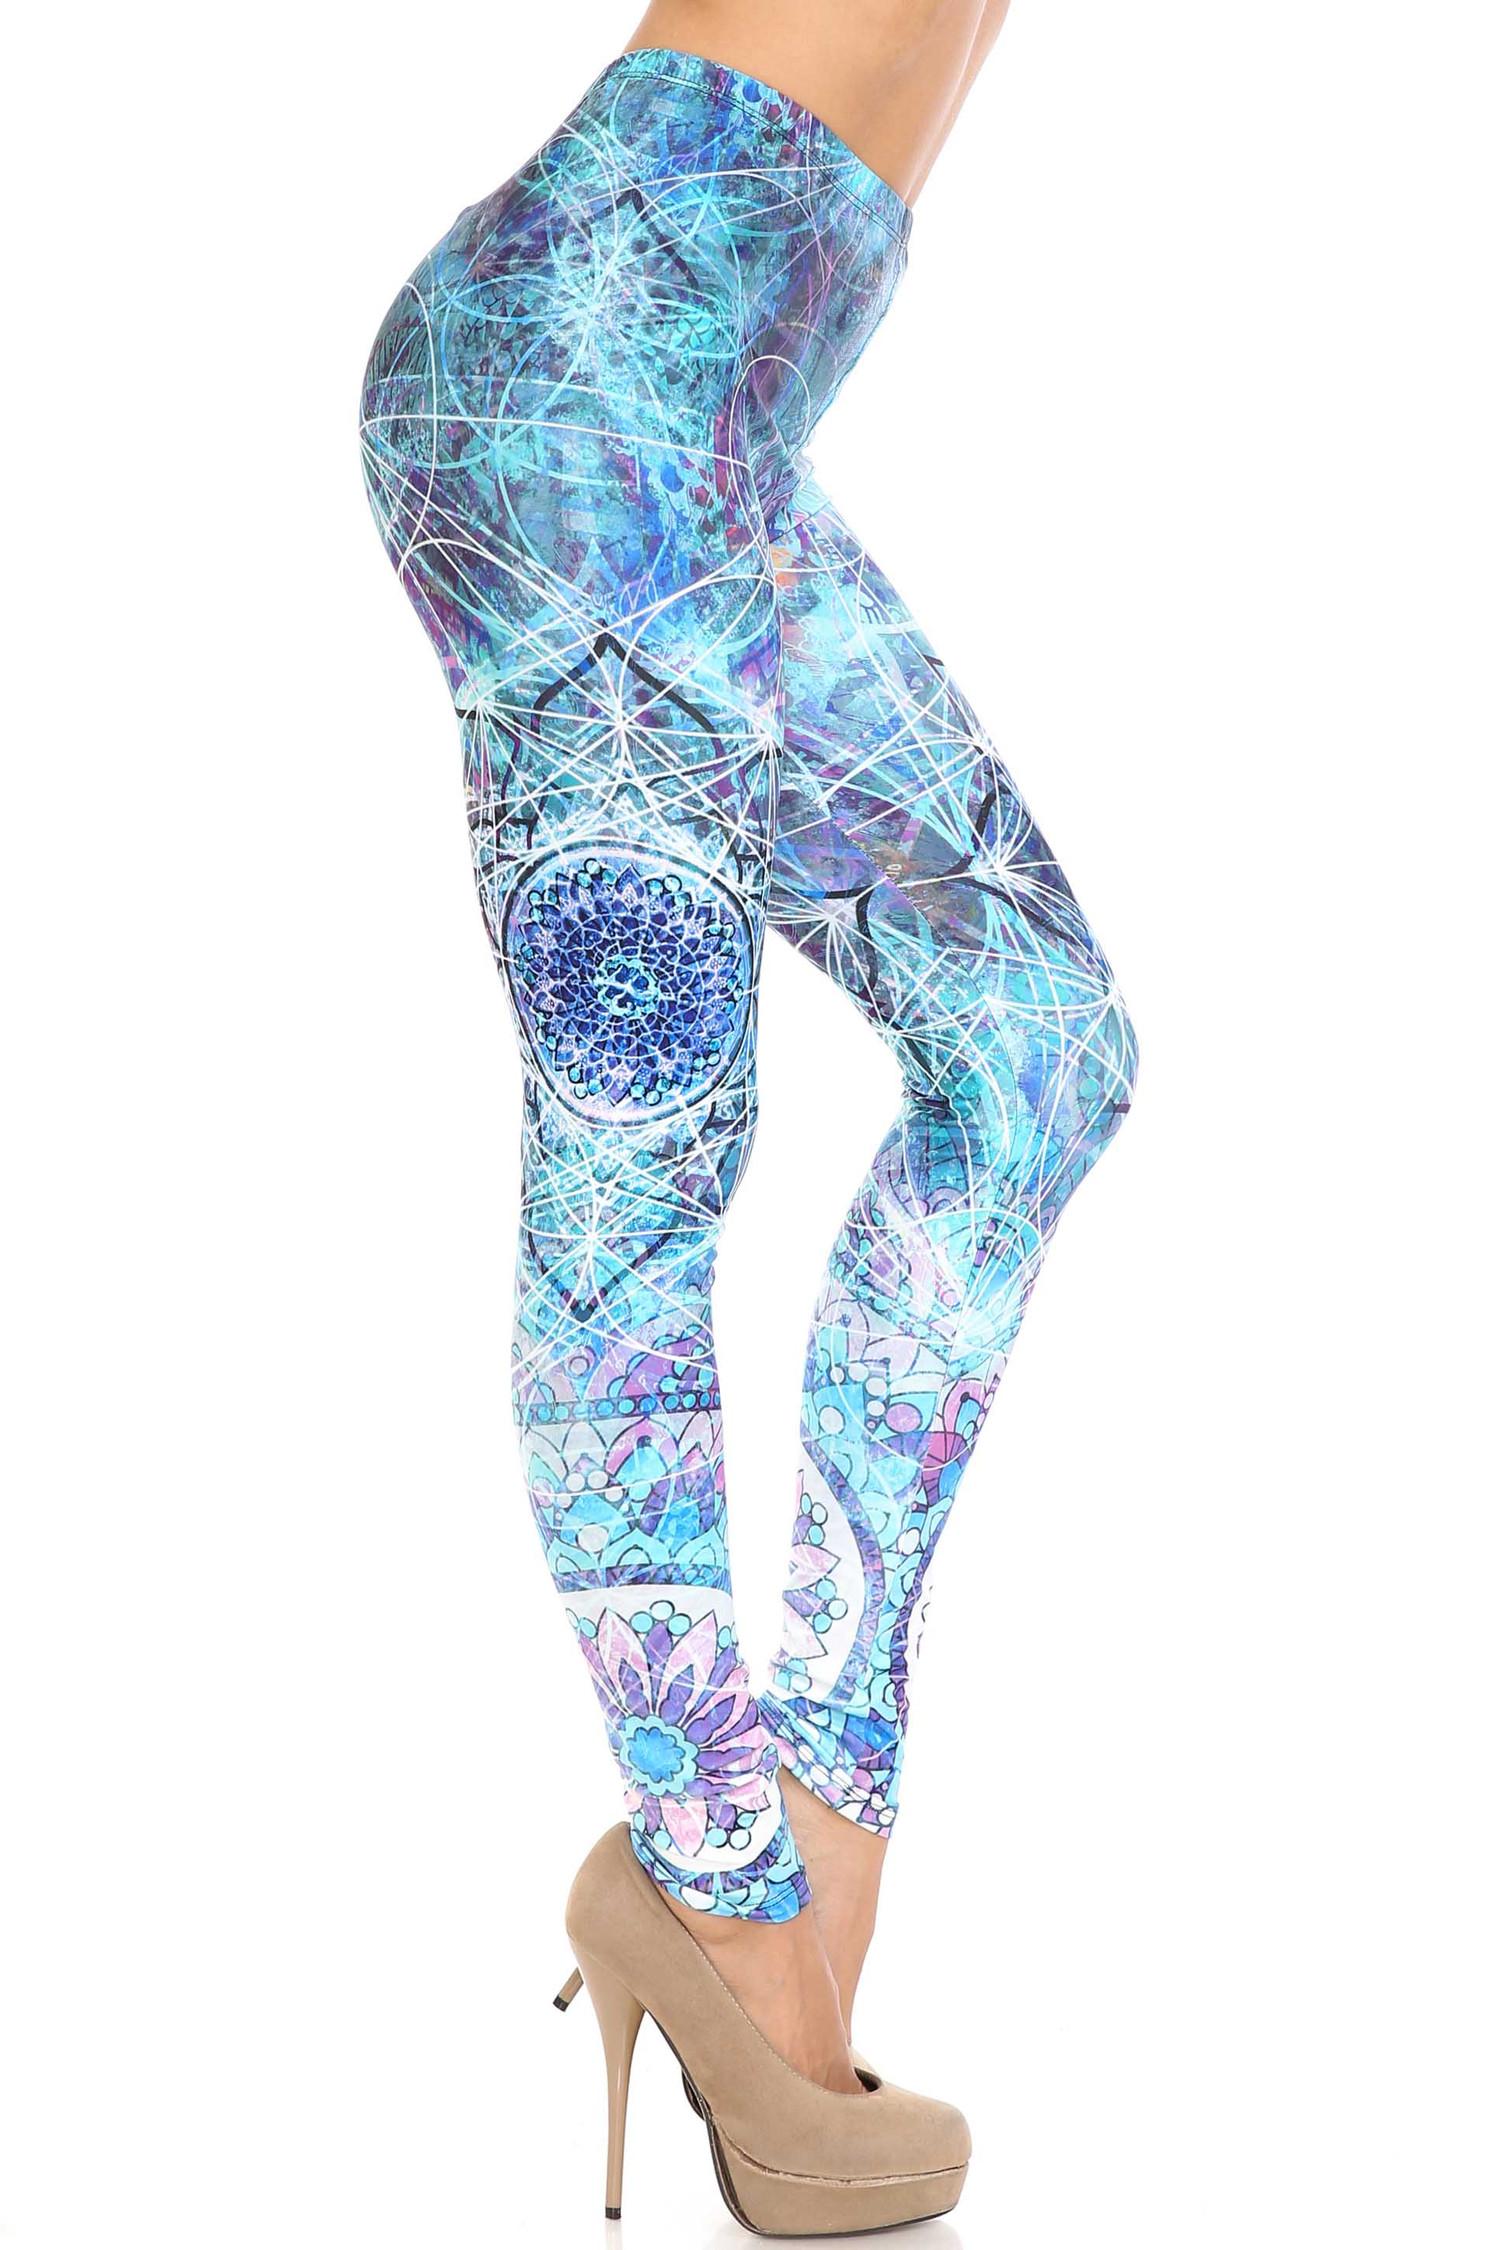 Creamy Soft Cyan Mandala Extra Plus Size Leggings - 3X-5X - USA Fashion™